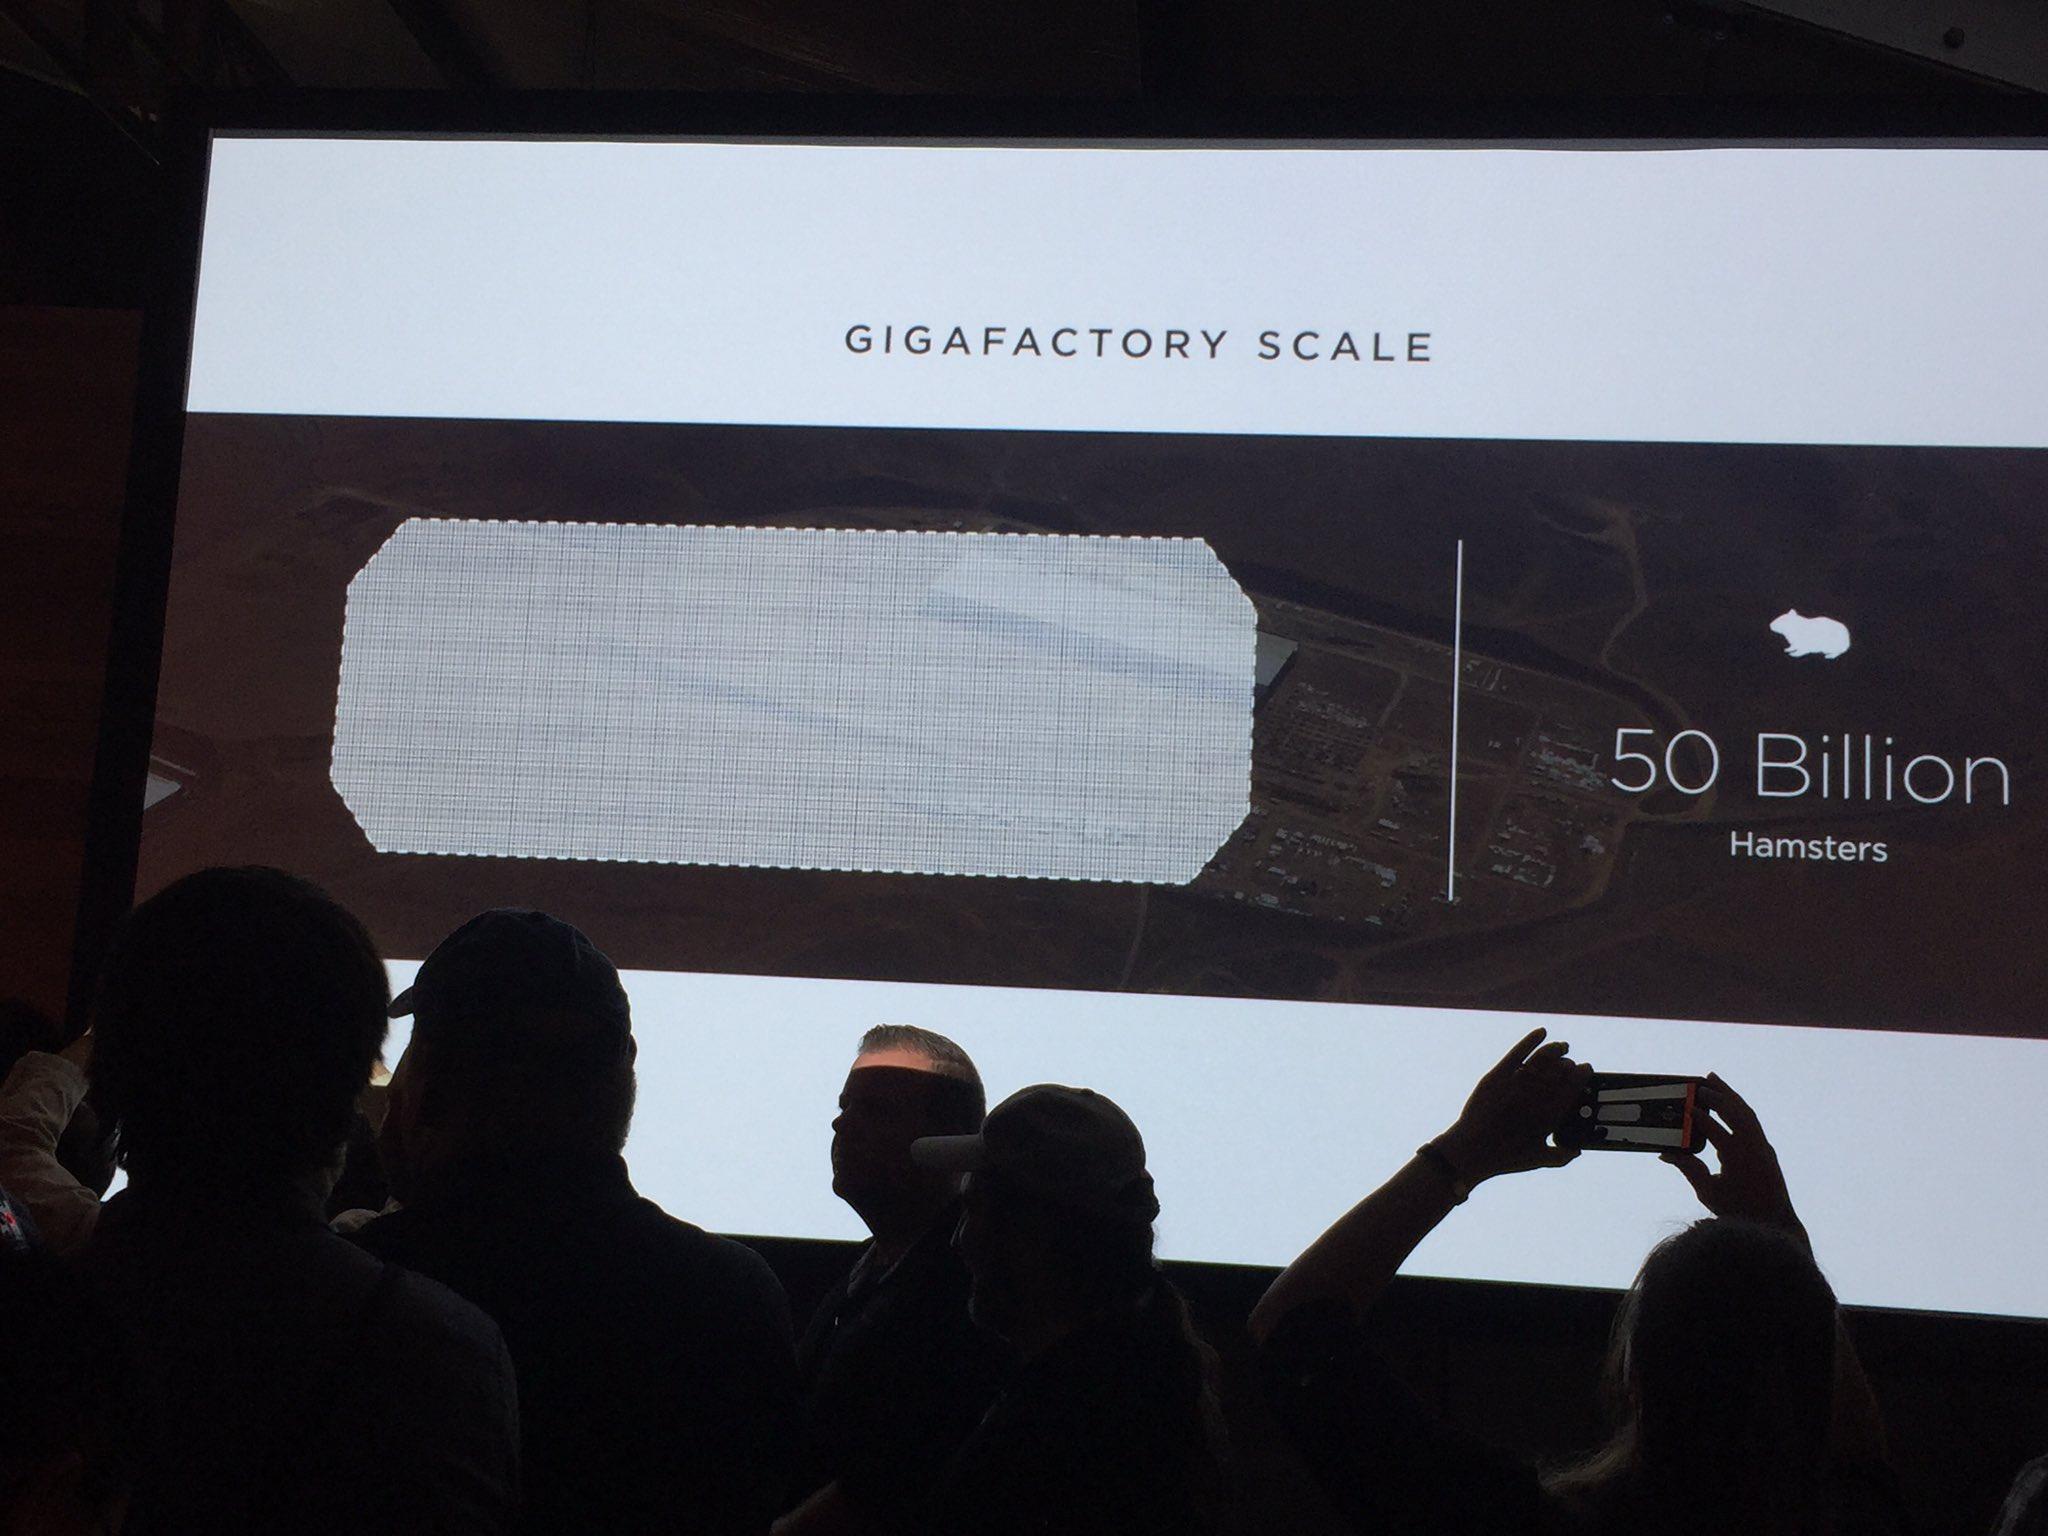 Gigafactory-50B-Hamsters